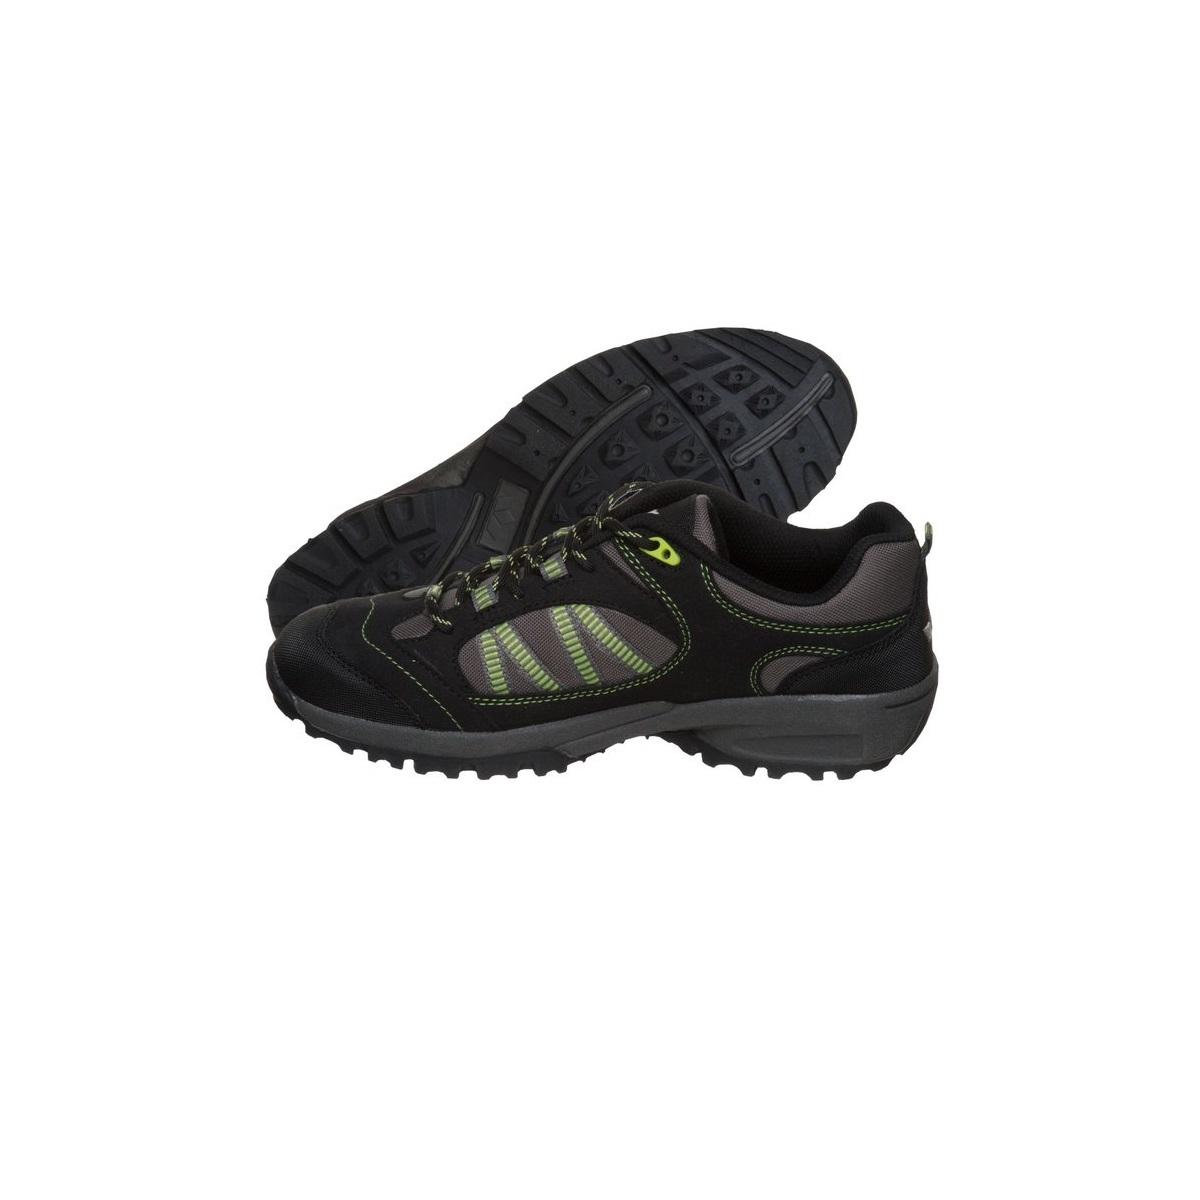 Lico Rancher Low Herren Freizeitschuhe Outdoor Schuhe – Bild 2